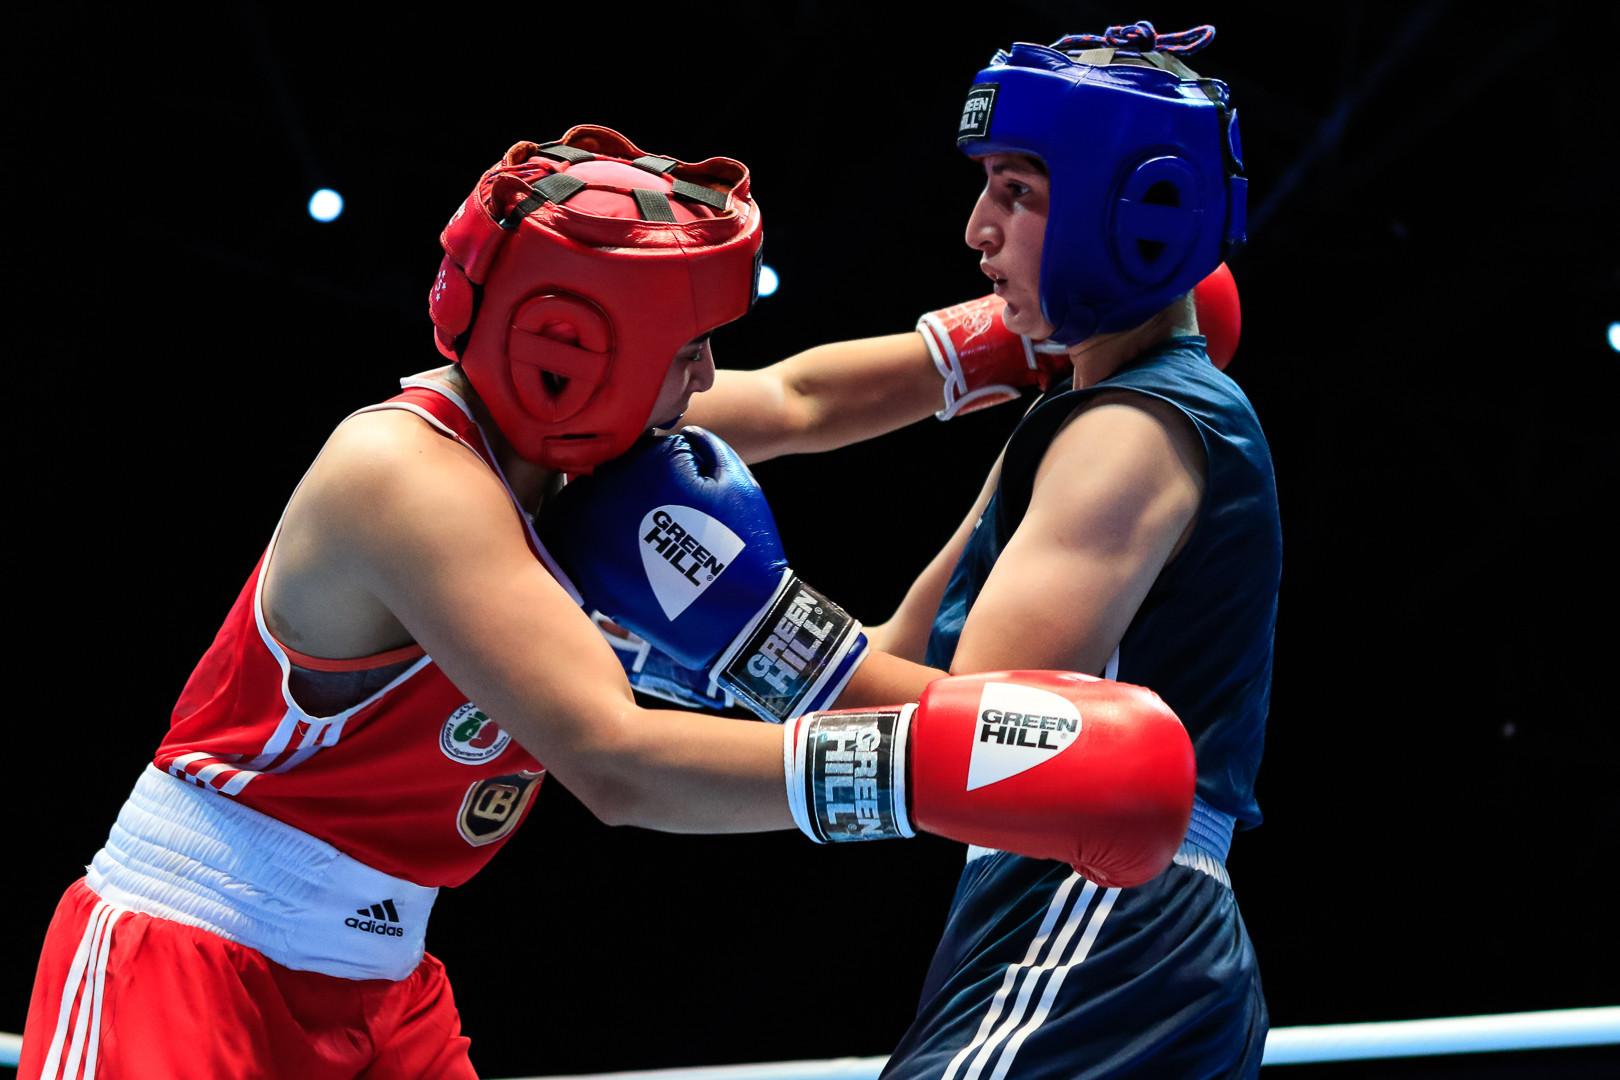 She edged past Chahira Selmouni of Algeria 3-2 to do so ©AIBA